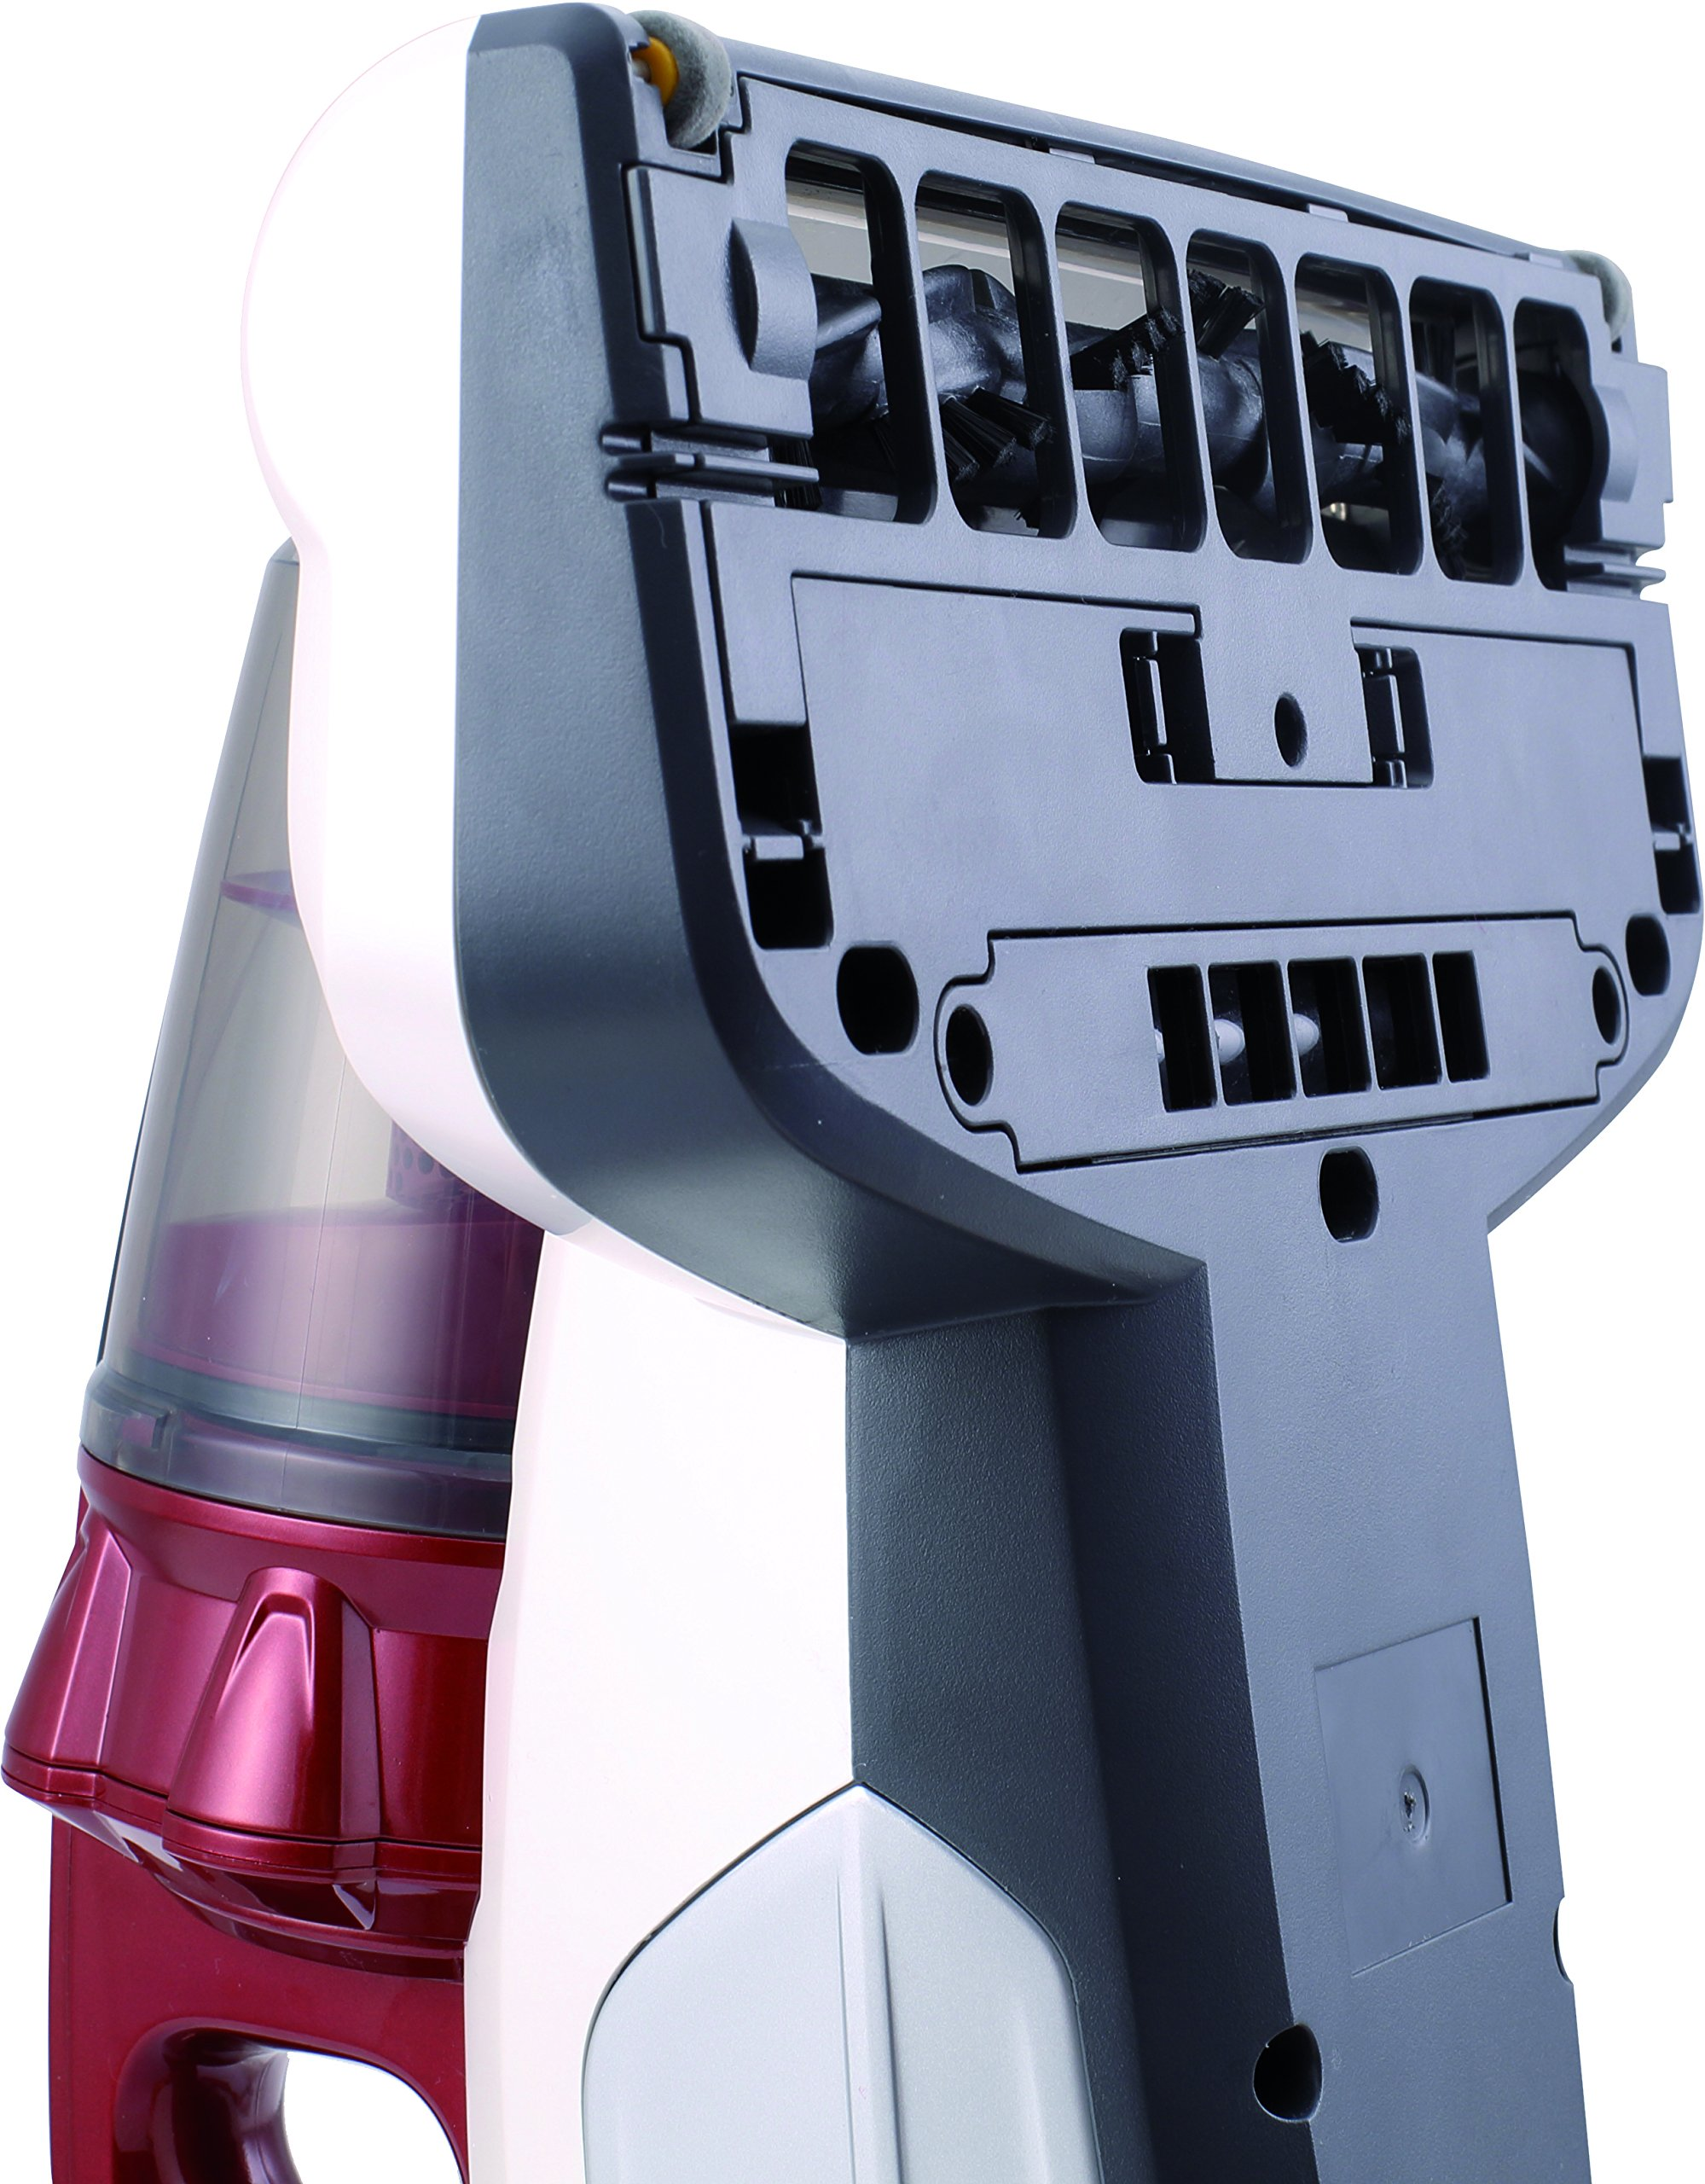 Hoover MBC 500UV Batti Materasso Ultra Vortex, 500 Watt, 3 Programmi, multicolore 5 spesavip